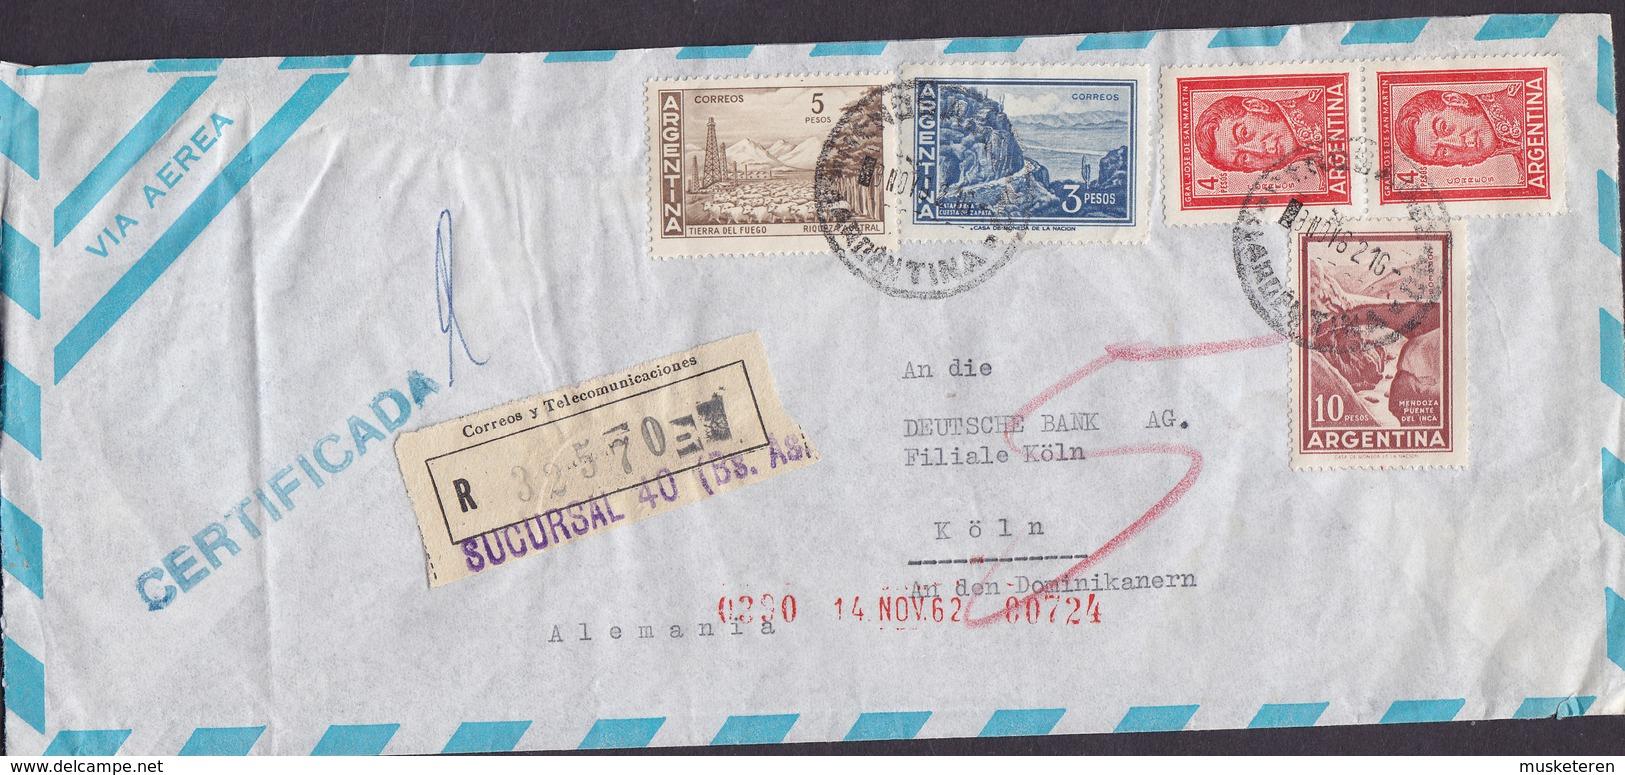 Argentina Via Aerea Registered Certificada Label SUCURSAL (40.) 1962 Cover Letra DEUTSCHE BANK Germany San Martin - Argentinien